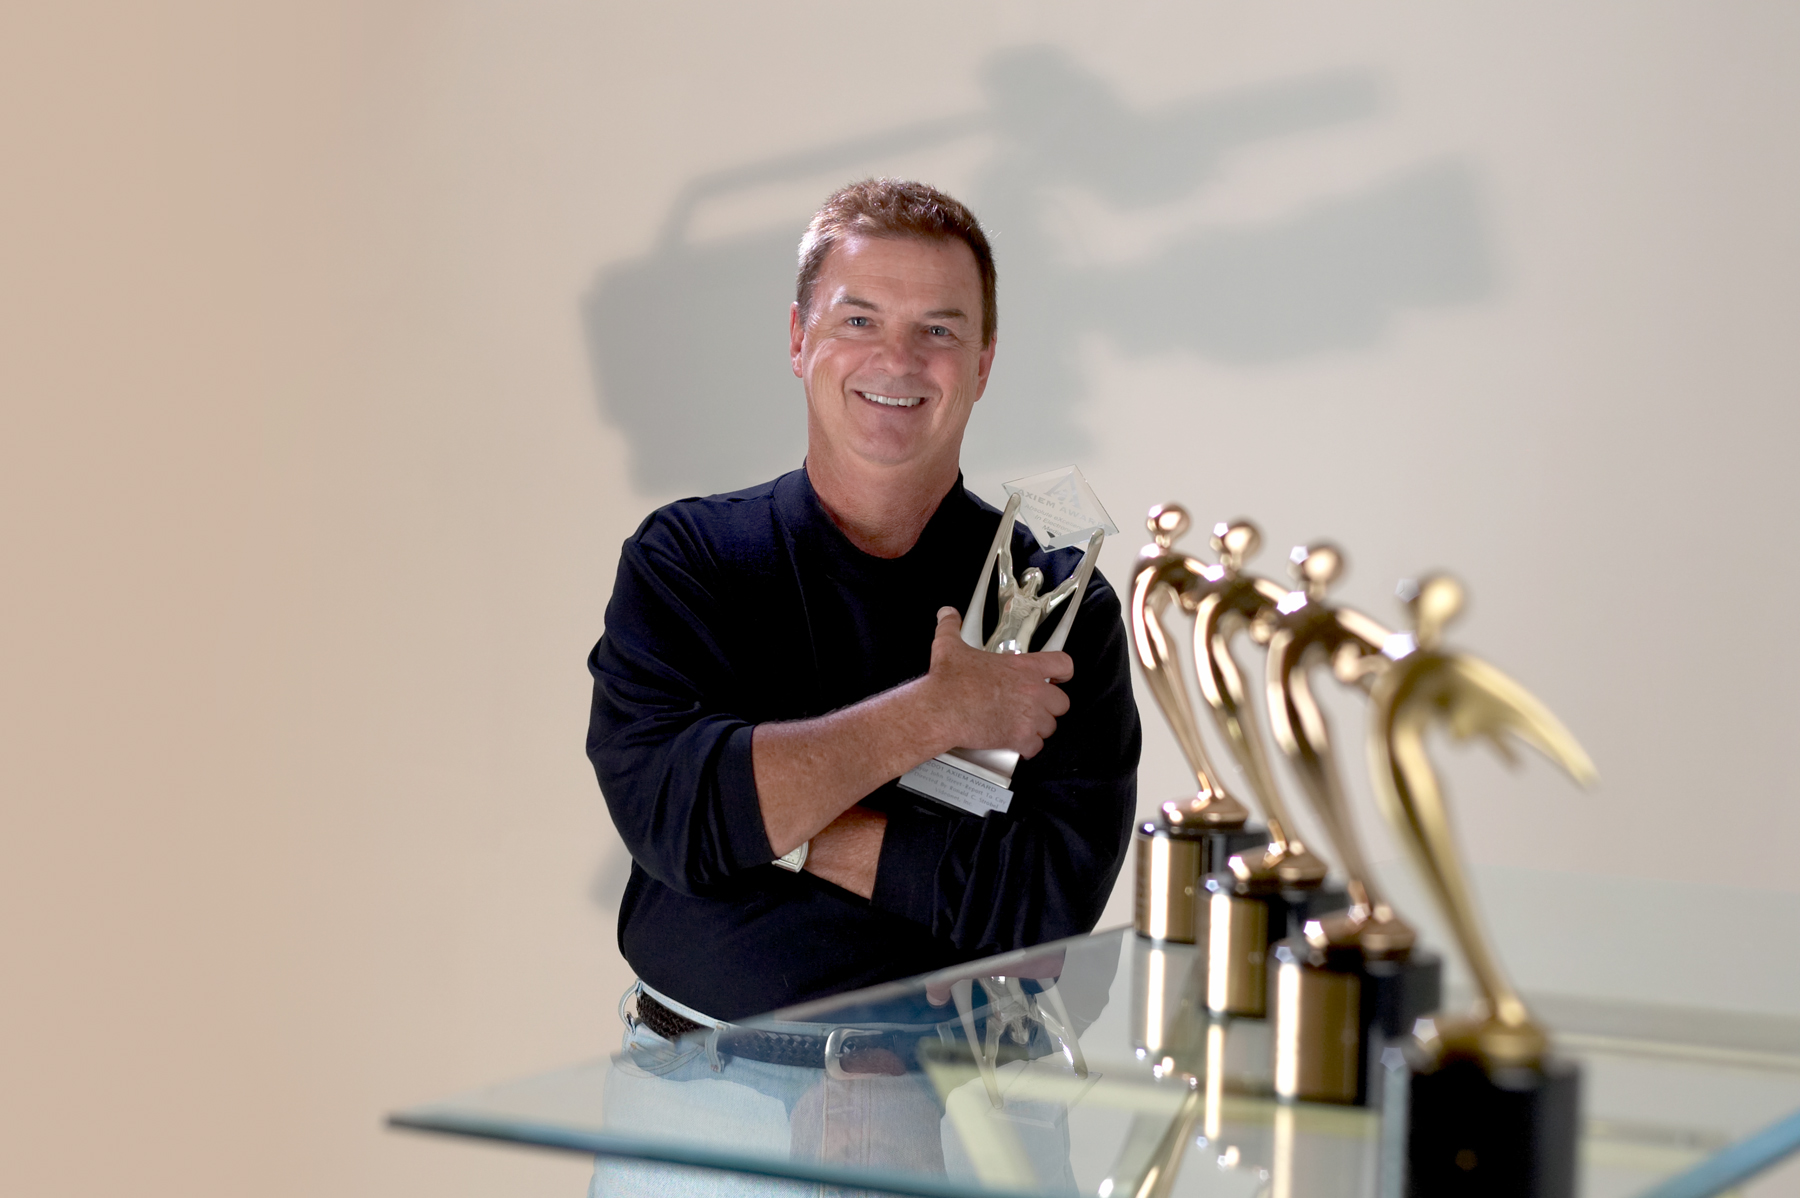 Ron Strobel Corporate Video